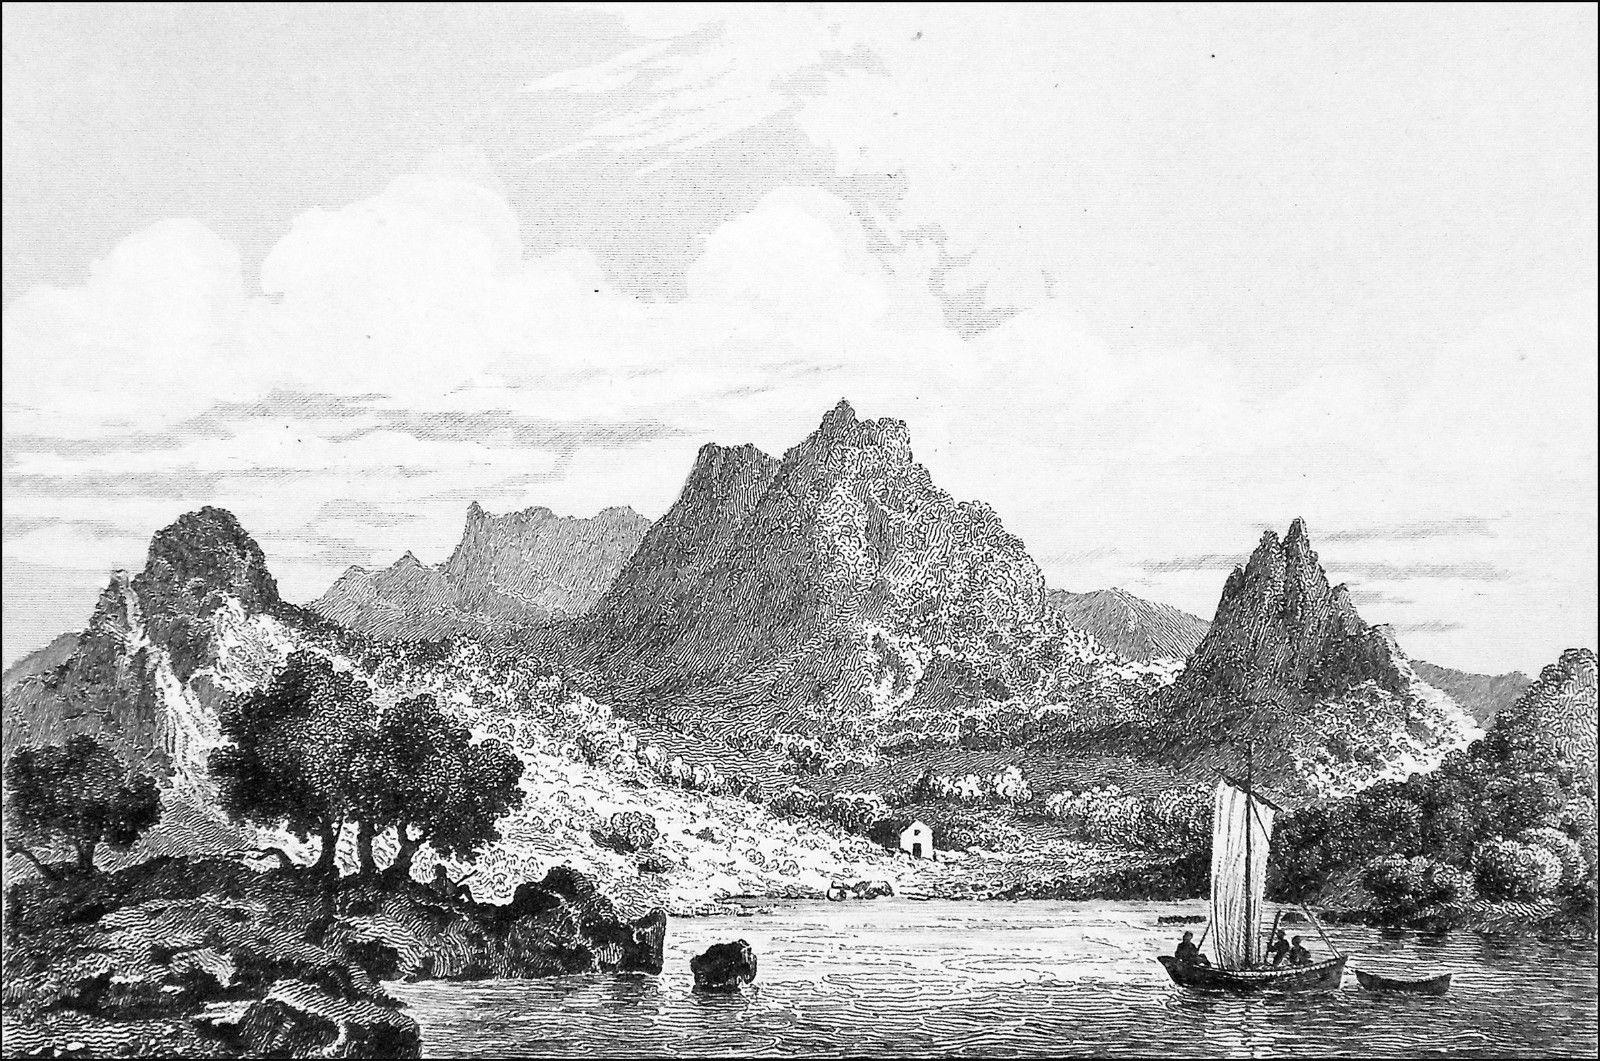 A 19th century engraving of Juan Fernández Island.